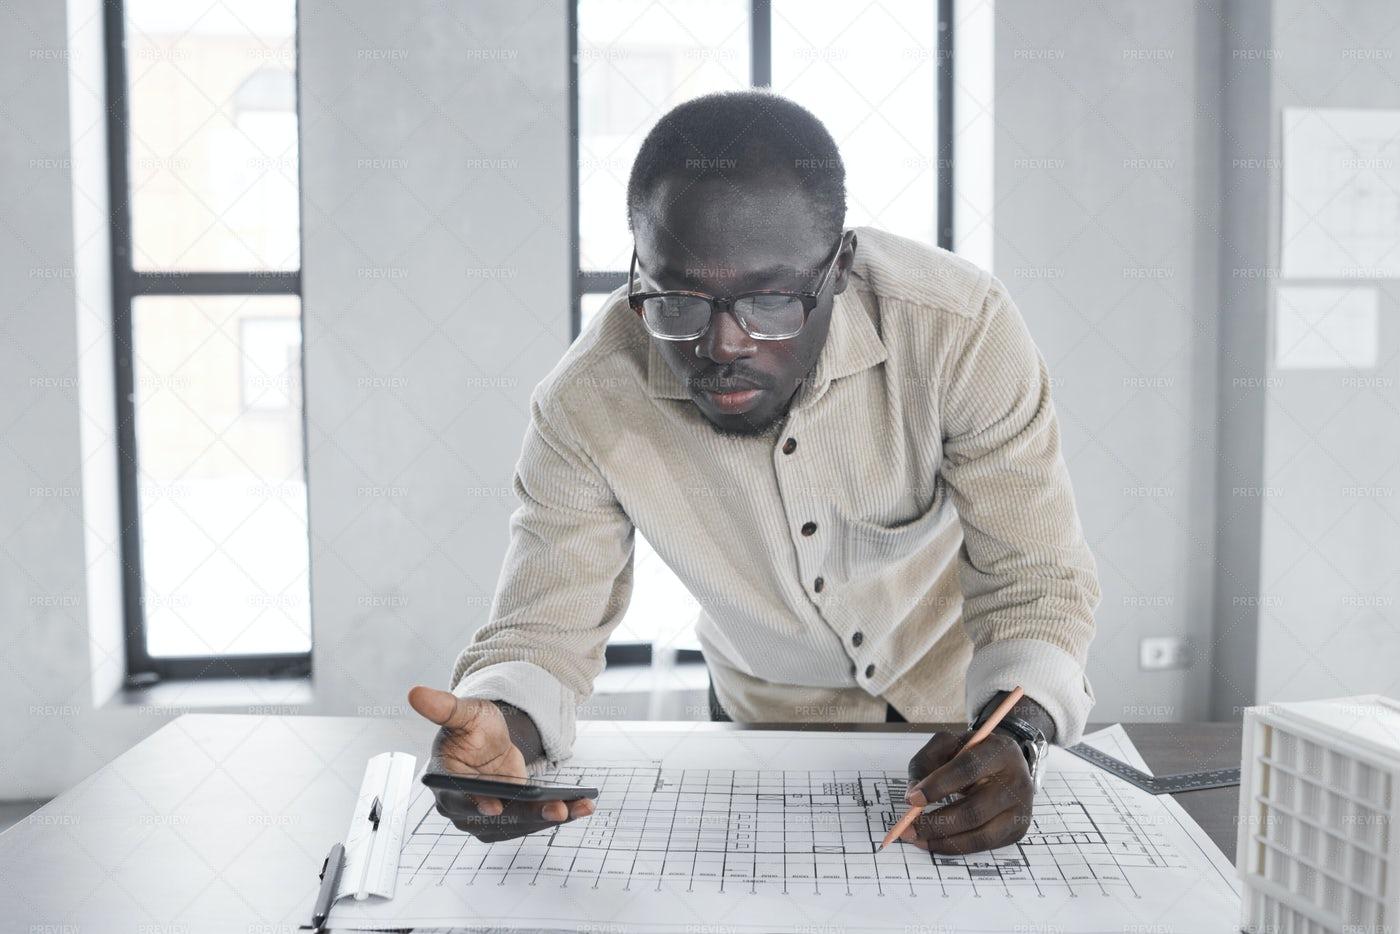 Architect Working Over Blueprint: Stock Photos